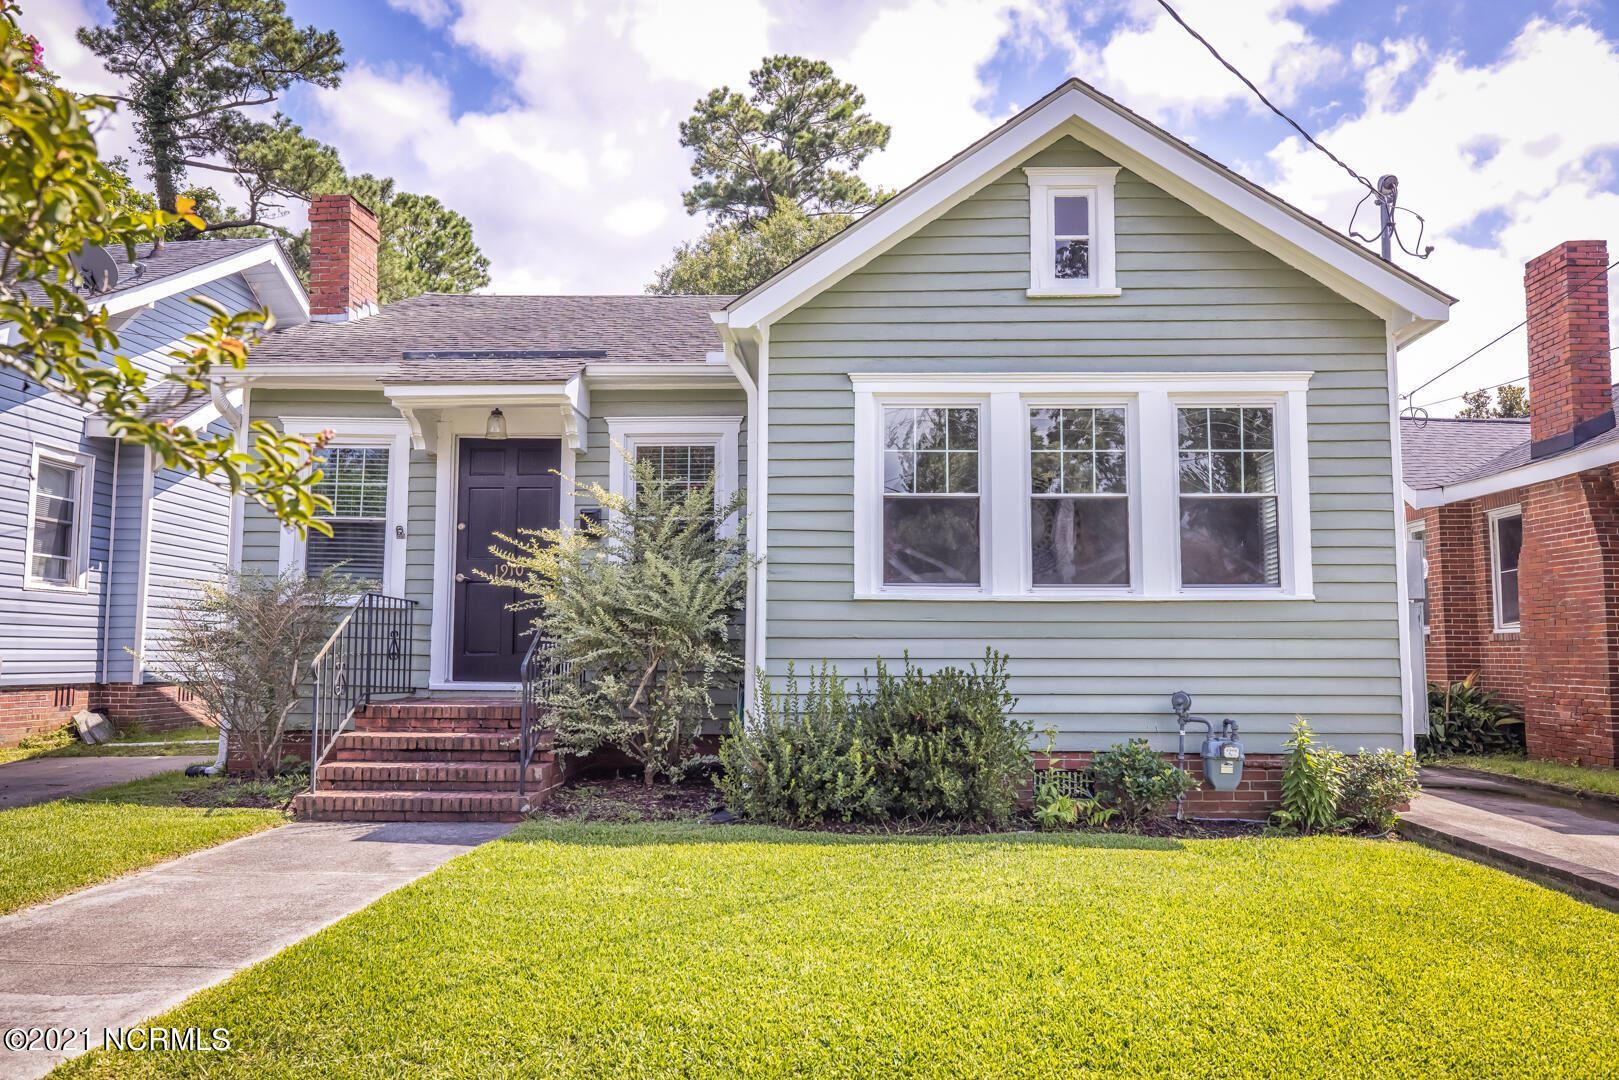 Photo for 1910 Nun Street, Wilmington, NC 28403 (MLS # 100284874)